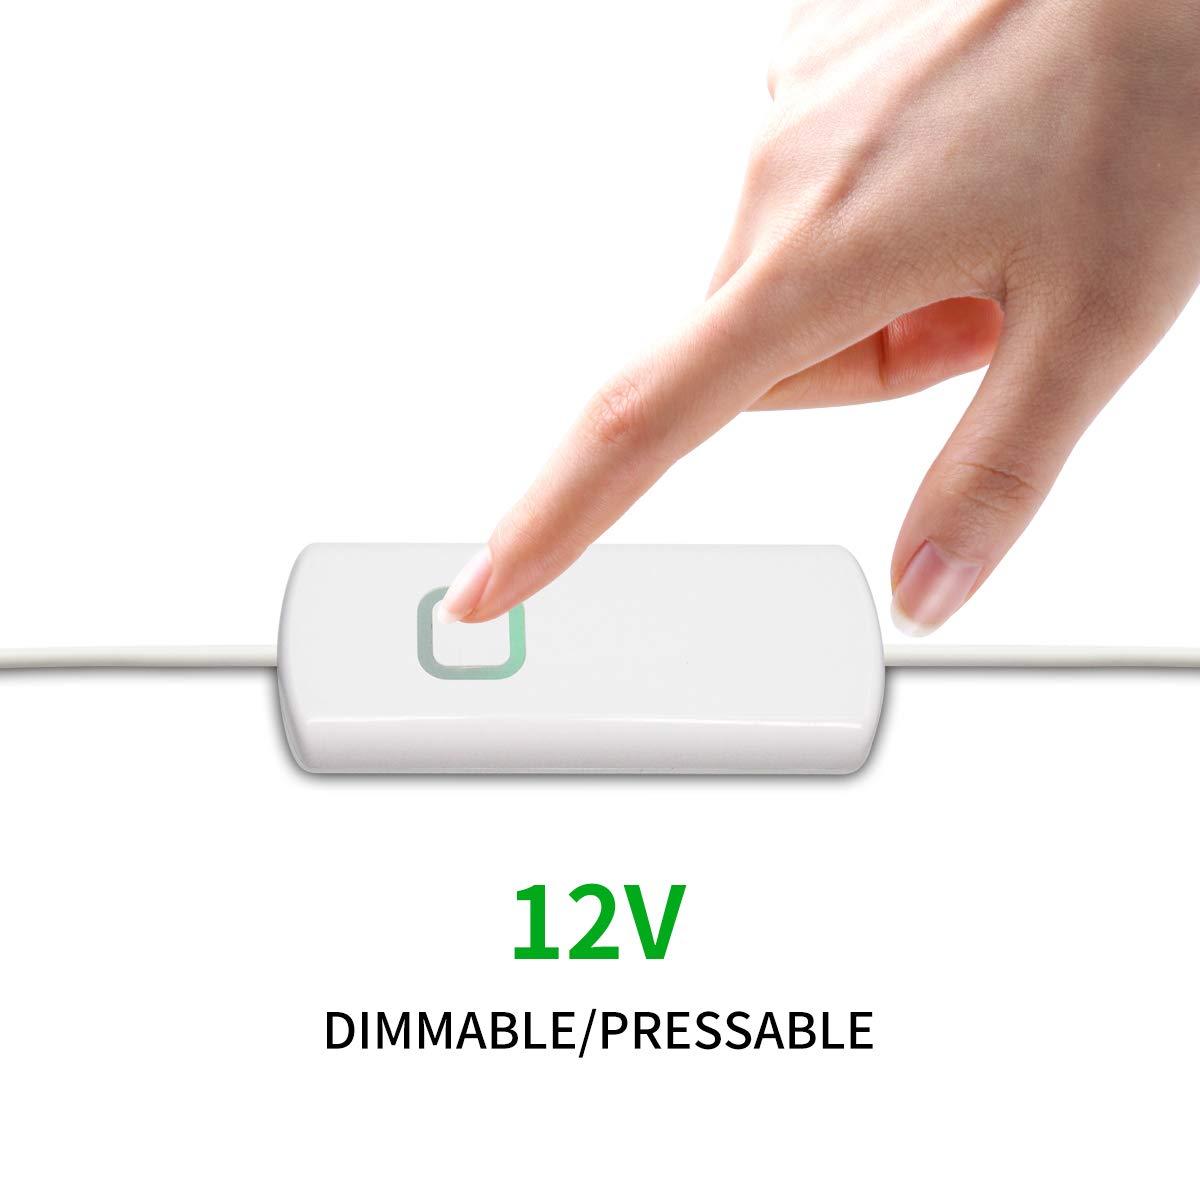 White Dimmer Switch for 12V Led Strip Lights Adjust Brightness Led Controller with Memory Function Smart Led Dimmer 1 Pack